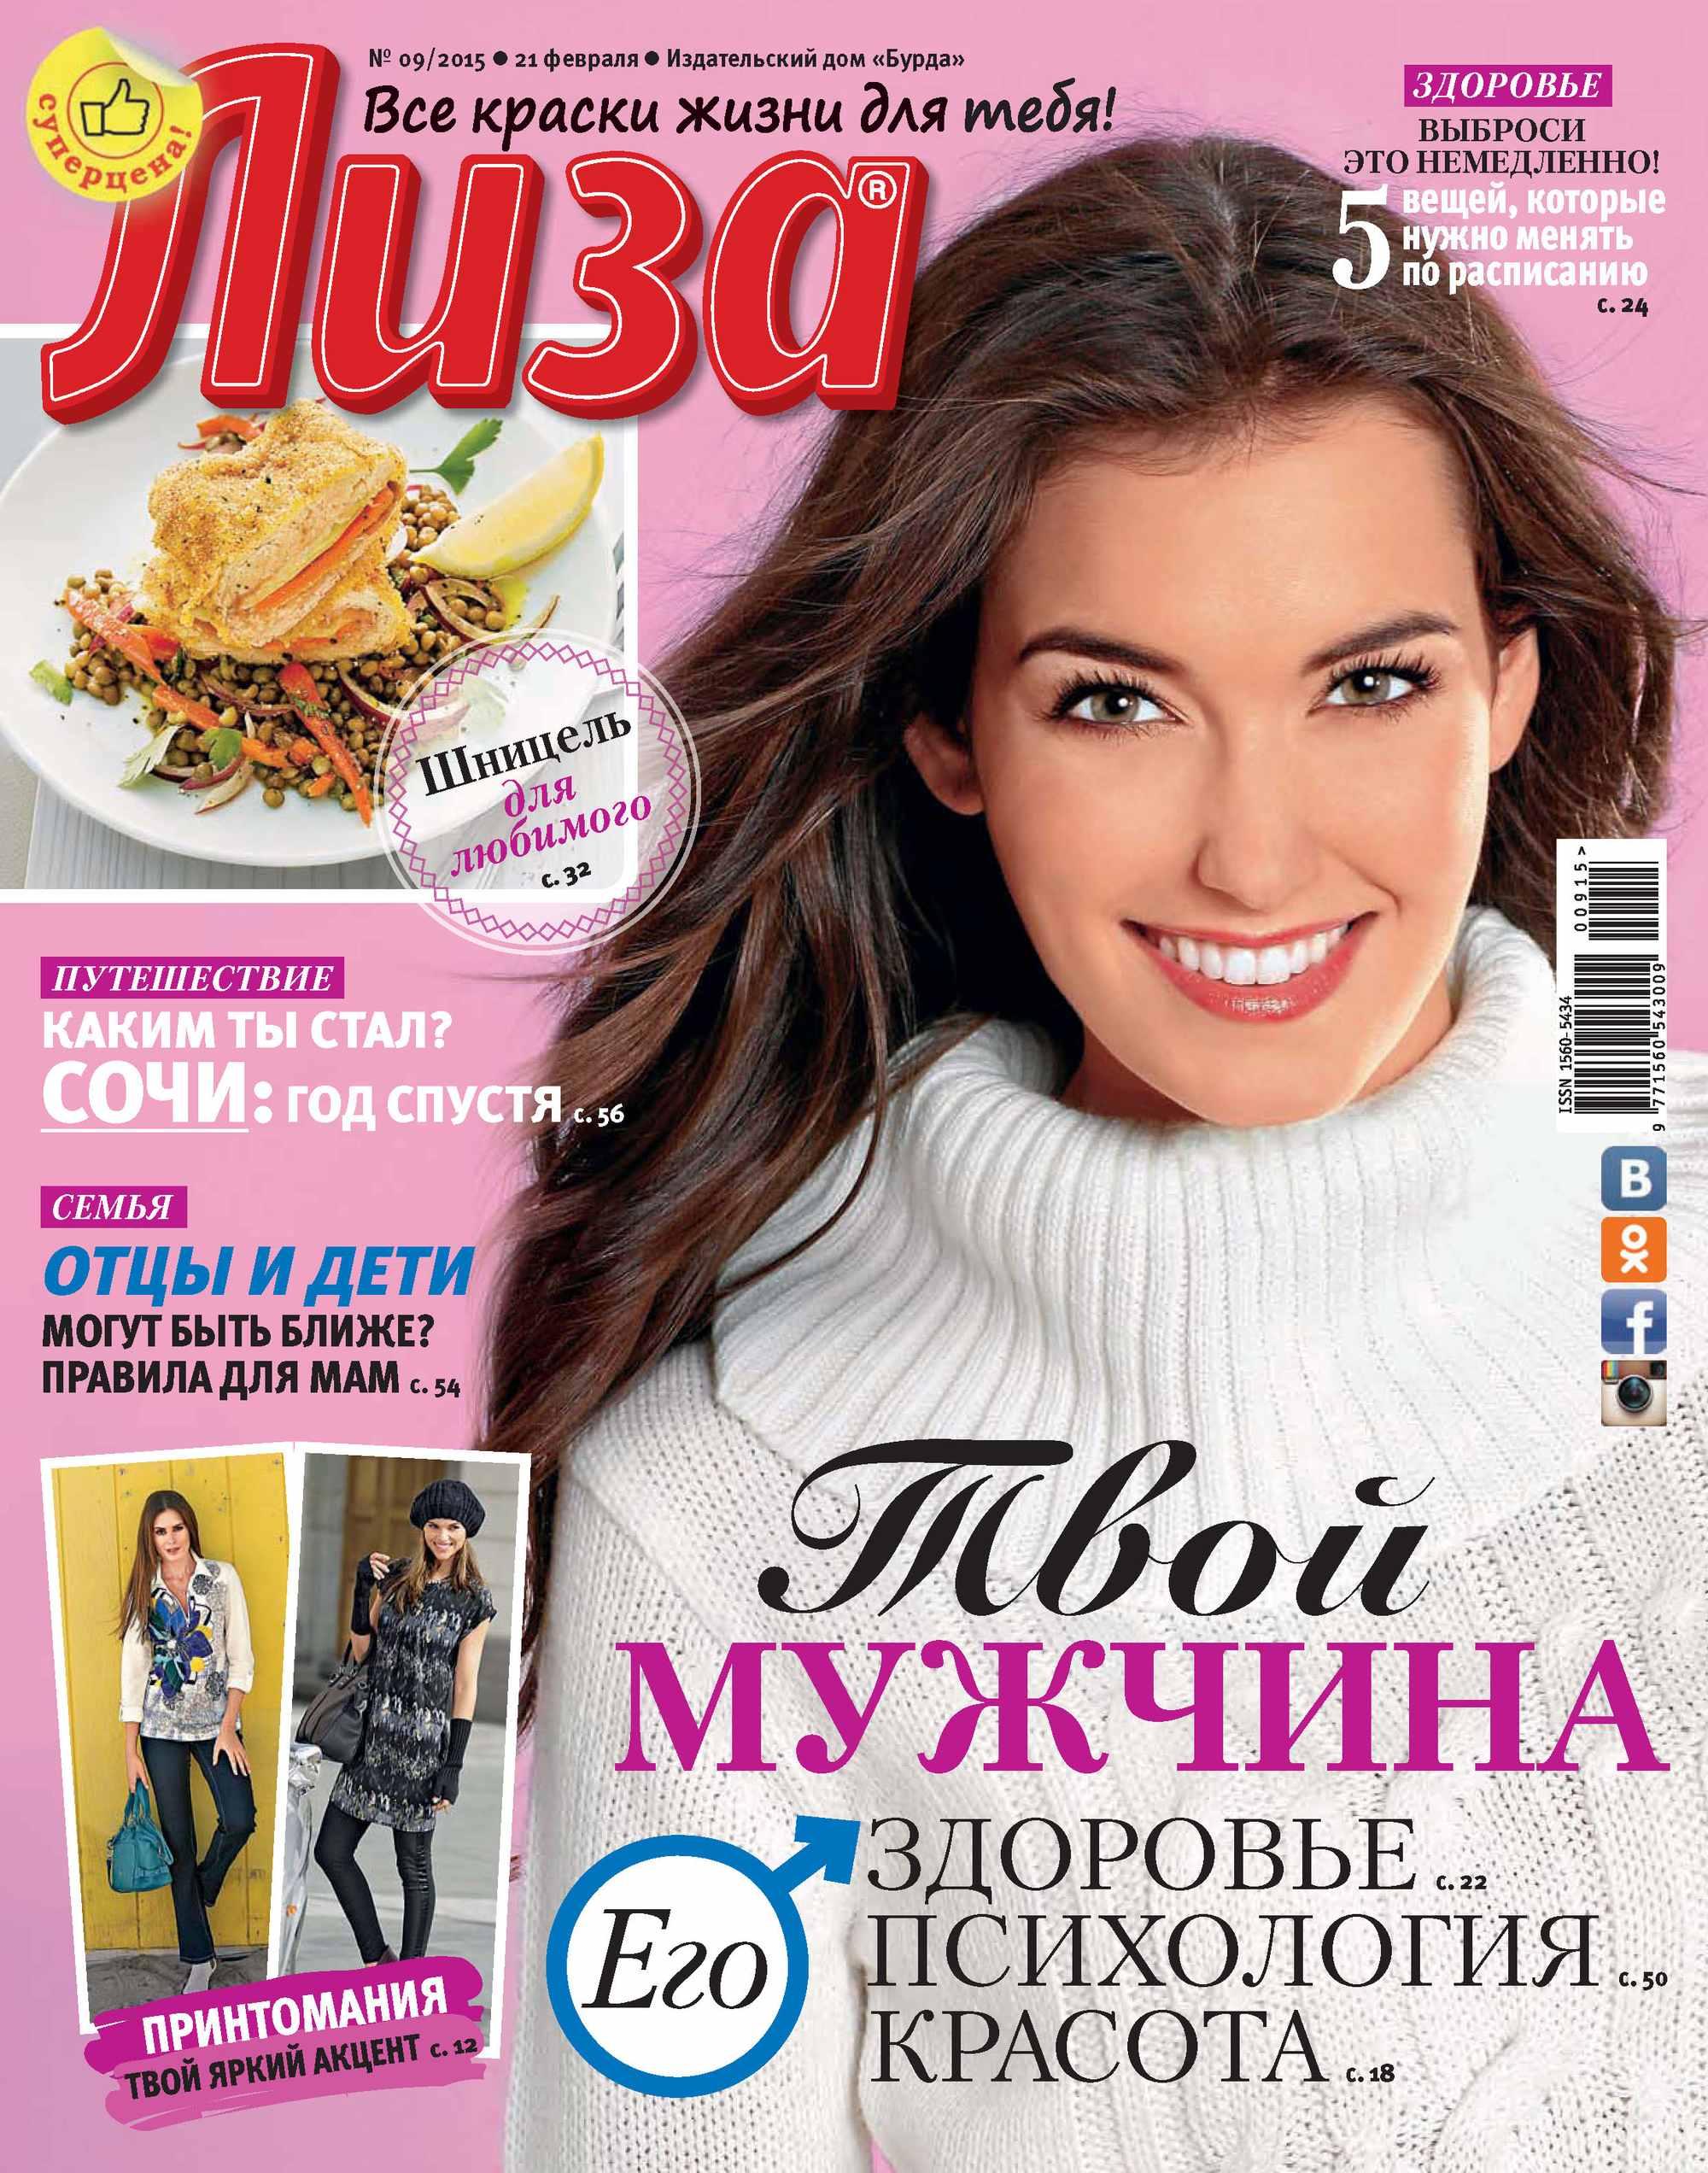 ИД «Бурда» Журнал «Лиза» №09/2015 ид бурда журнал лиза 37 2015